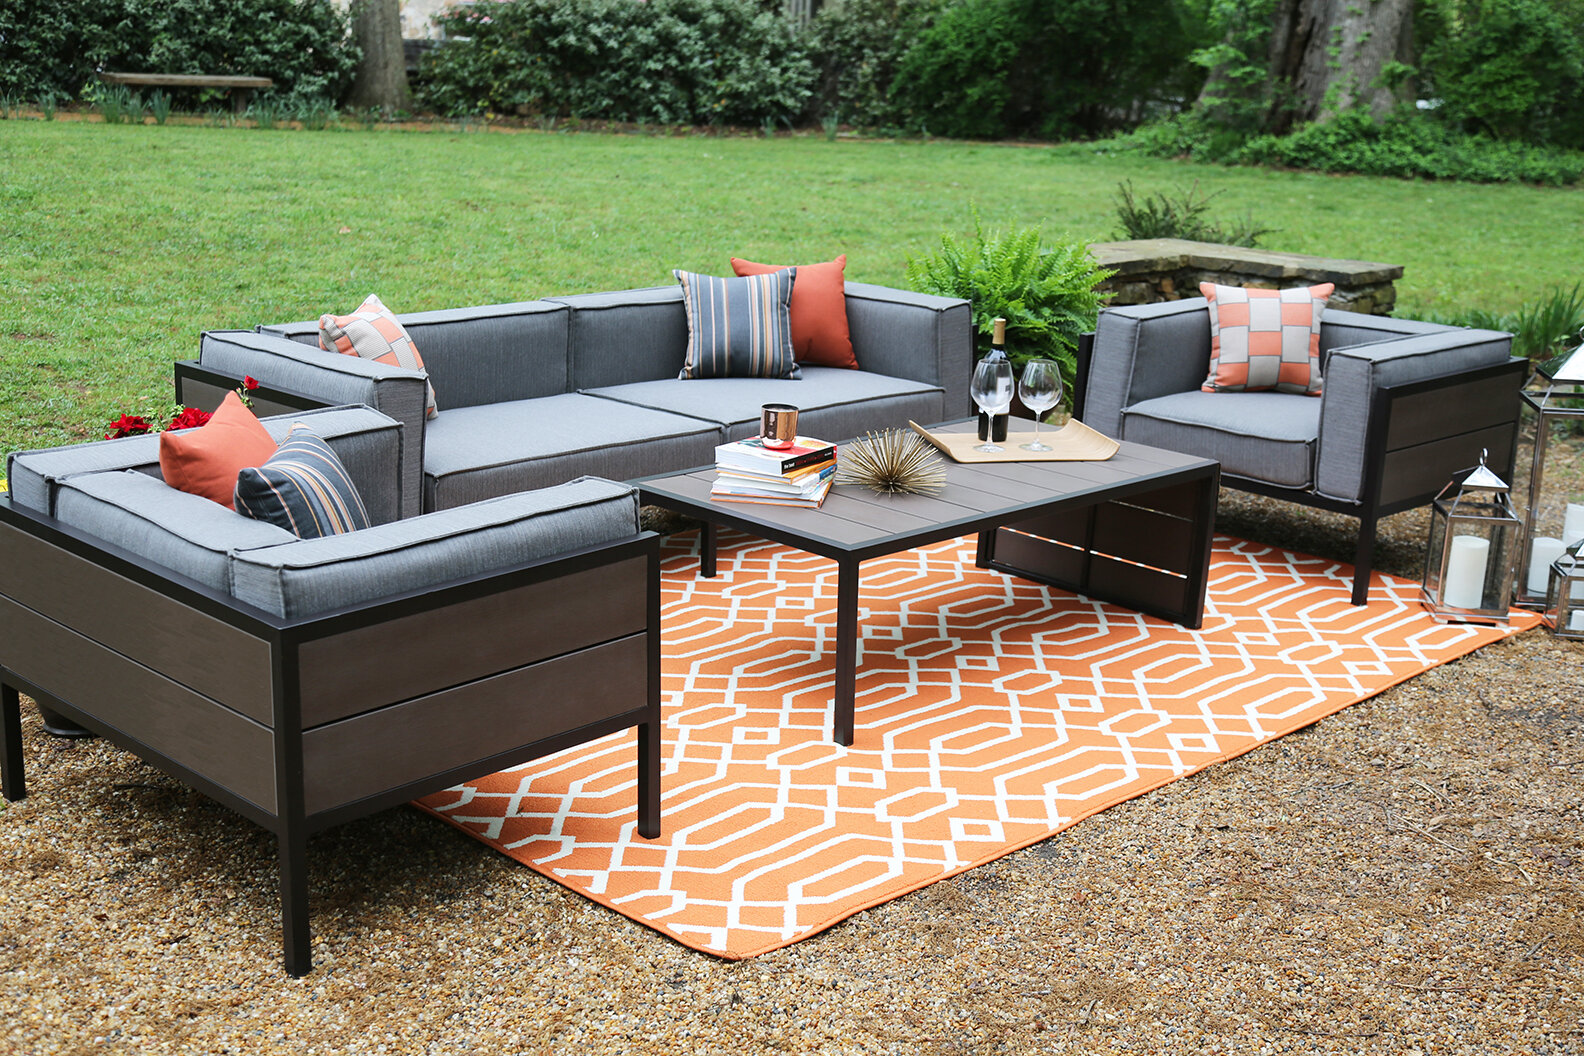 Ordinaire AE Outdoor Manhattan 4 Piece Sunbrella Sofa Set With Cushions U0026 Reviews |  Wayfair